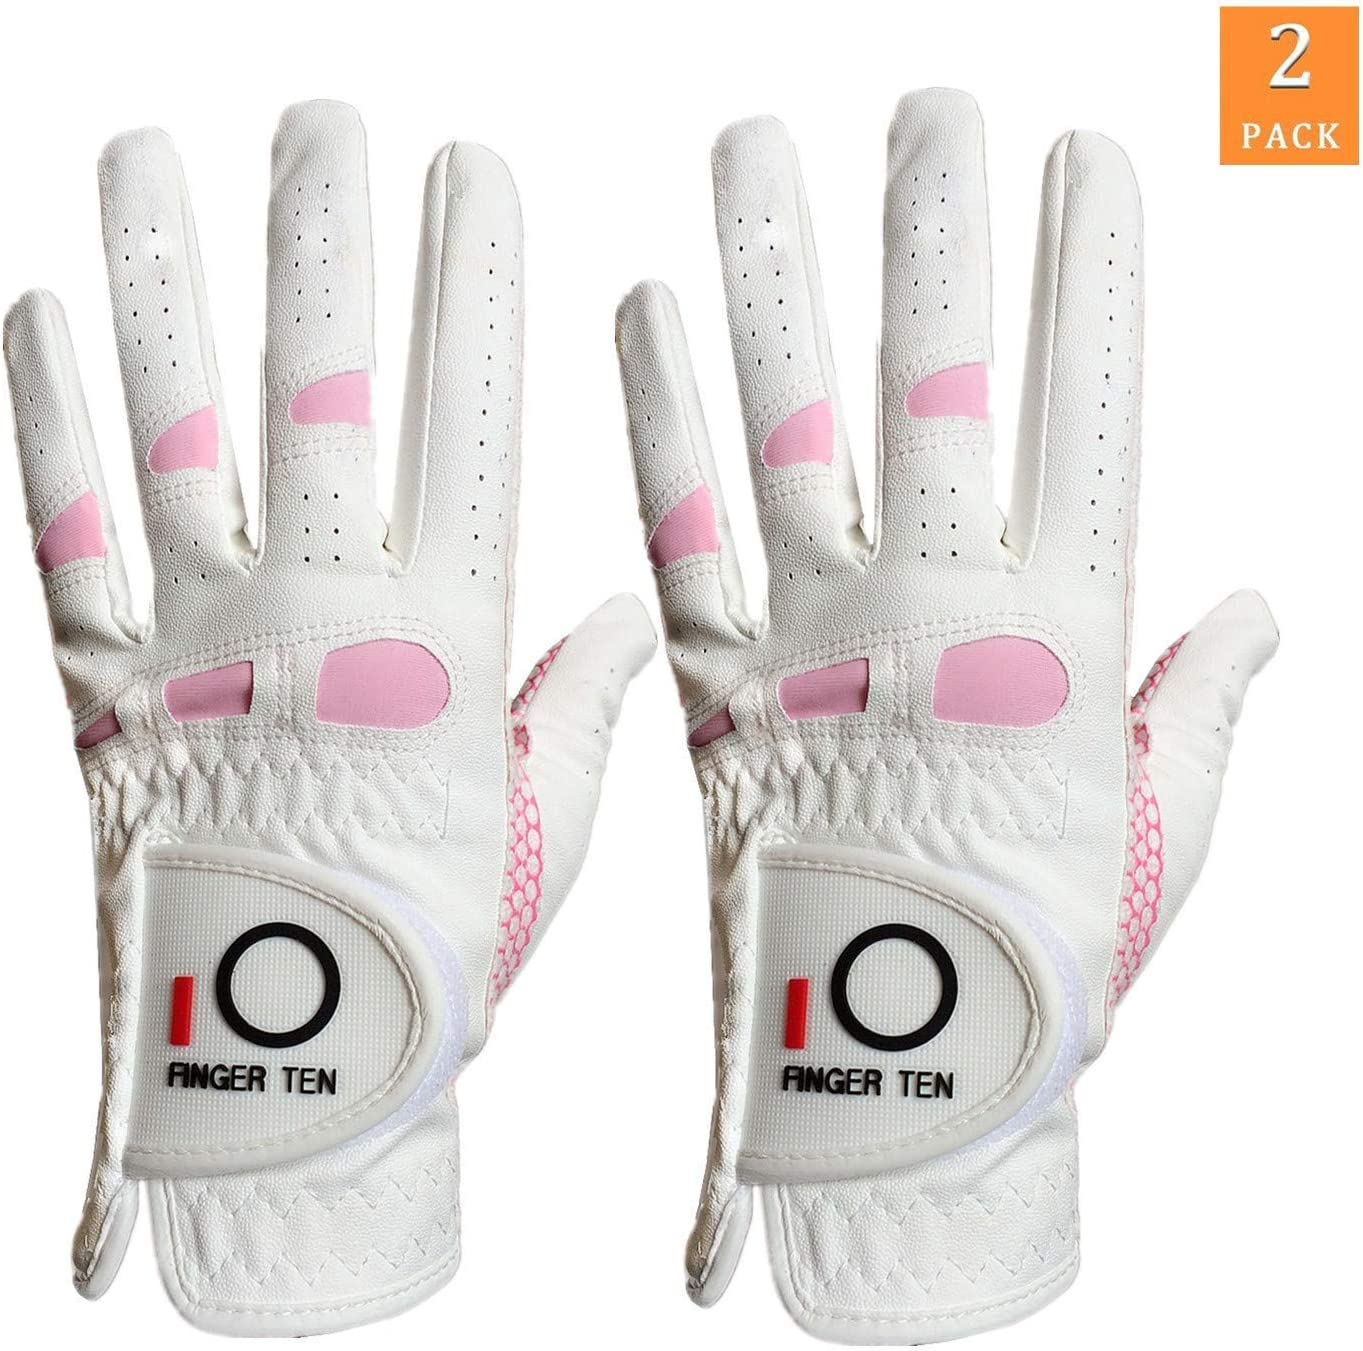 FINGER TEN Guantes de Golf Suaves para Mujer, Talla S, M, XL ...